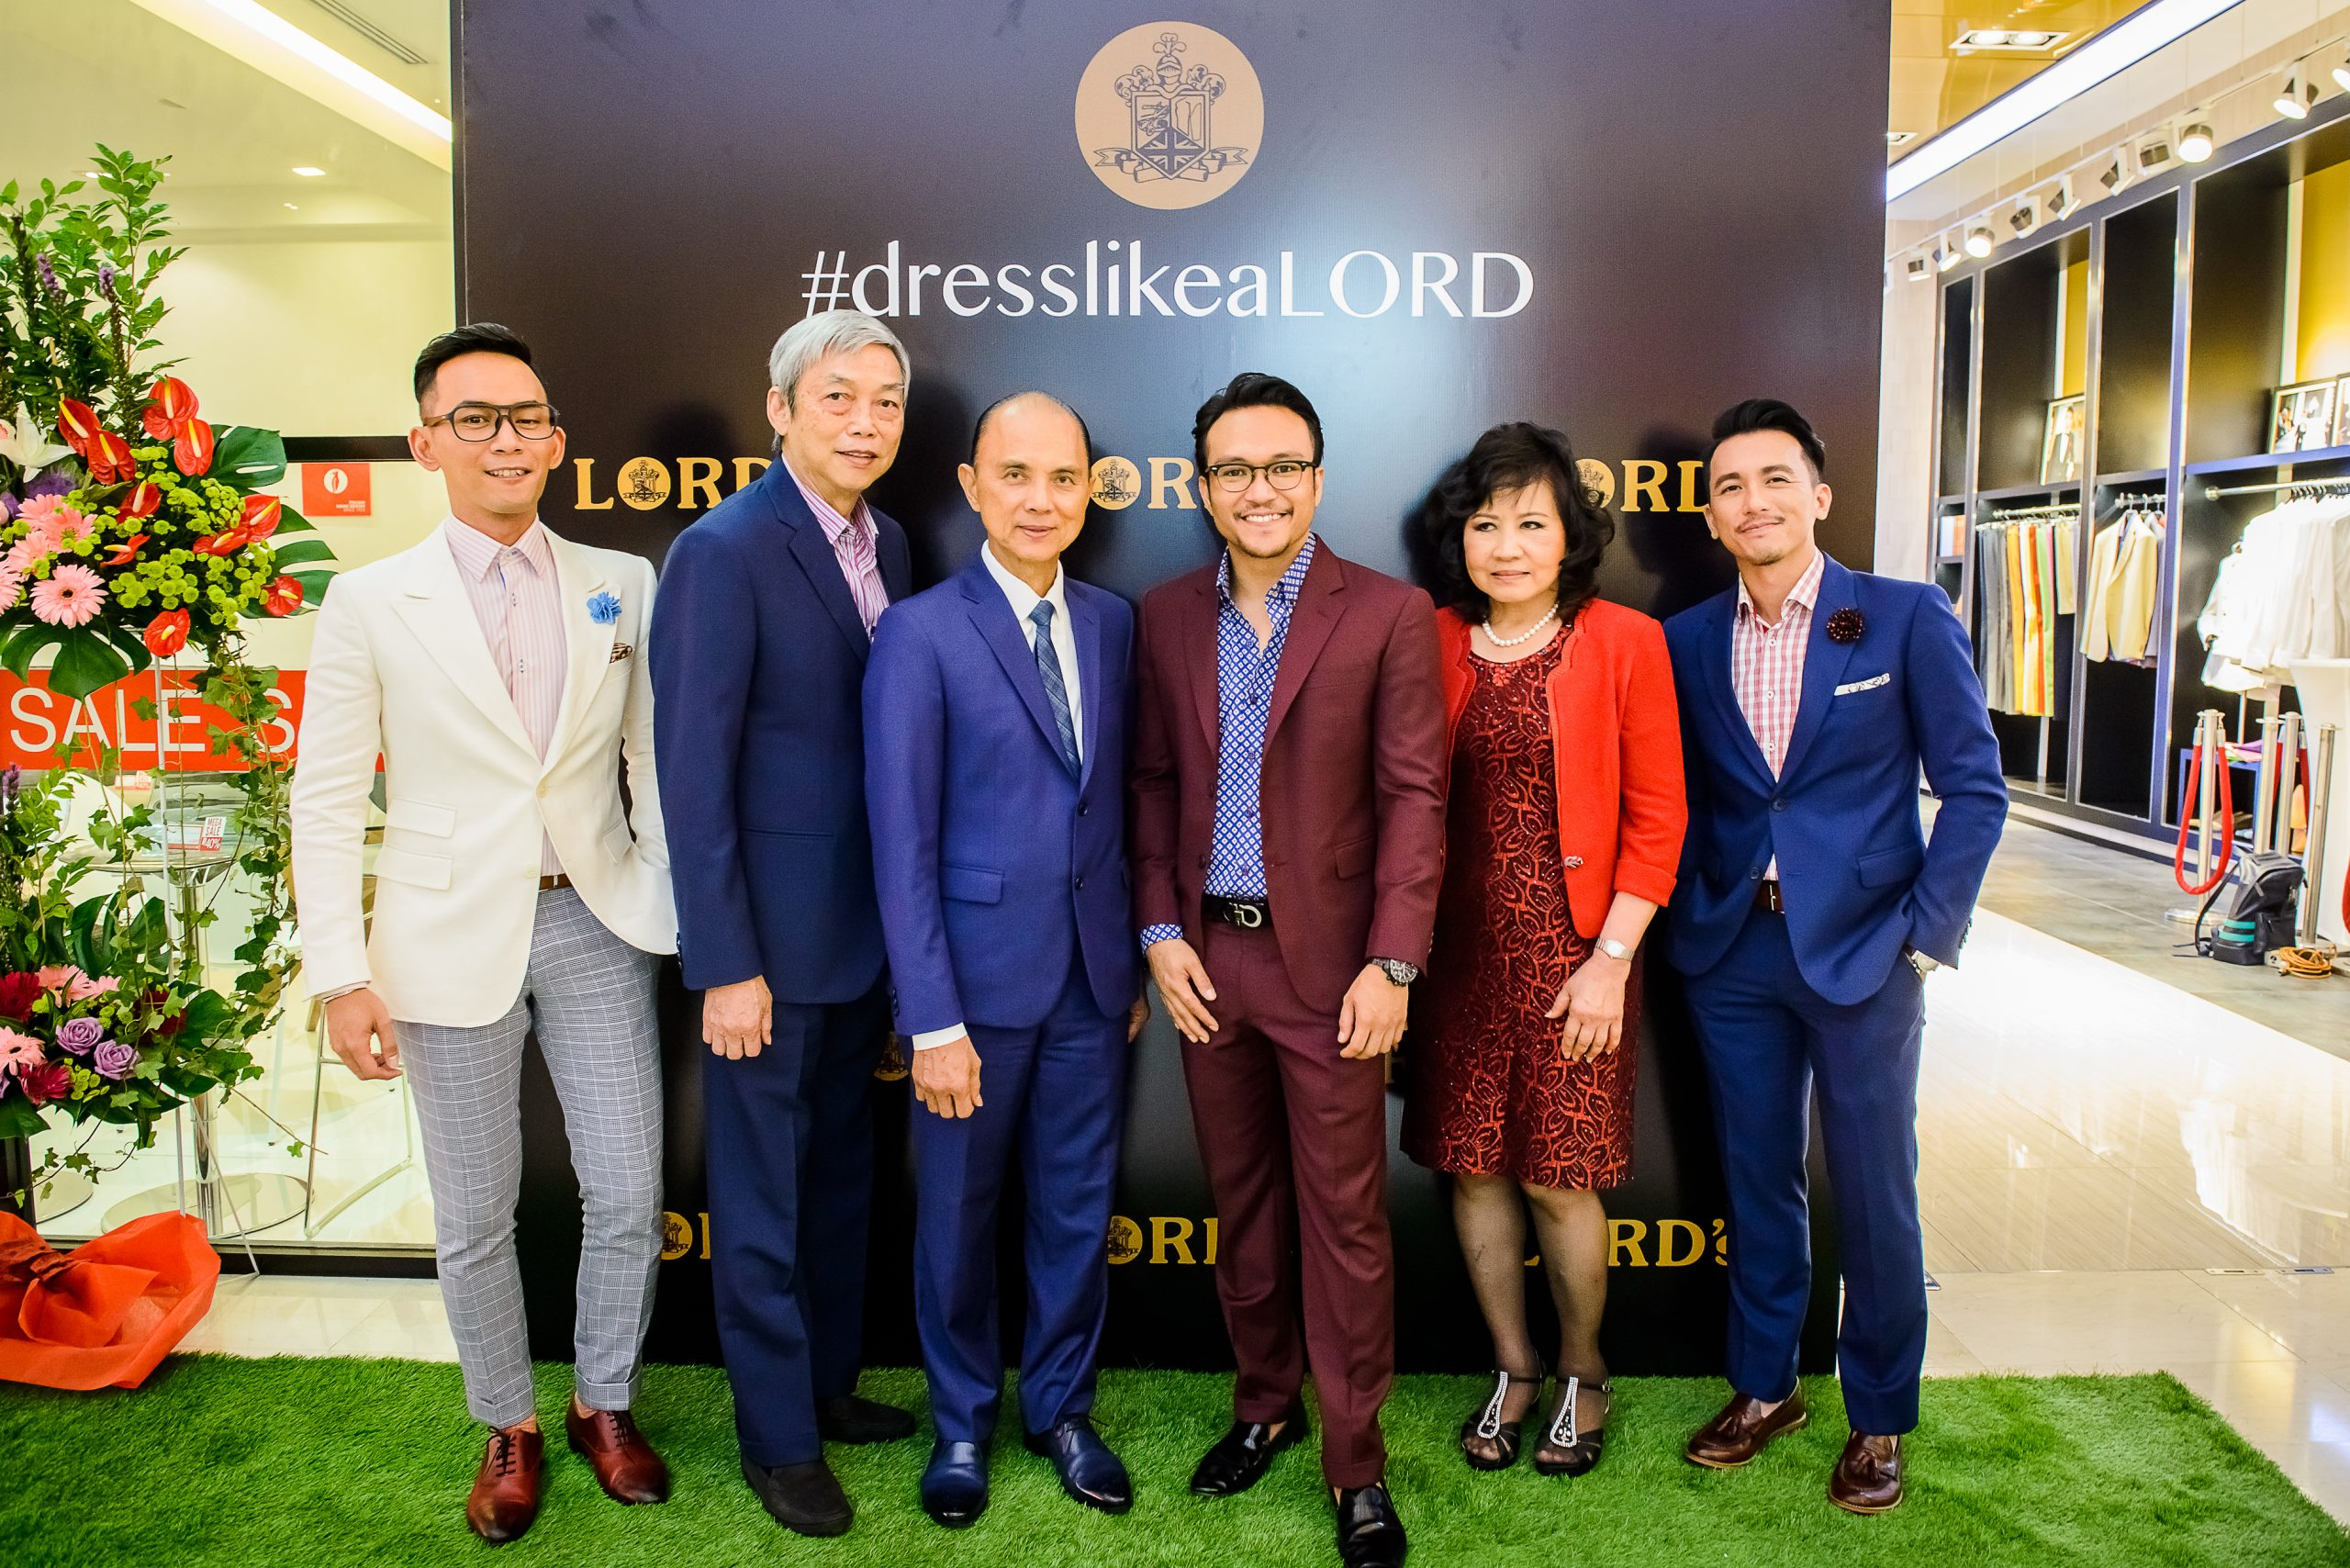 DresslikeaLORD – eCommerce Launch